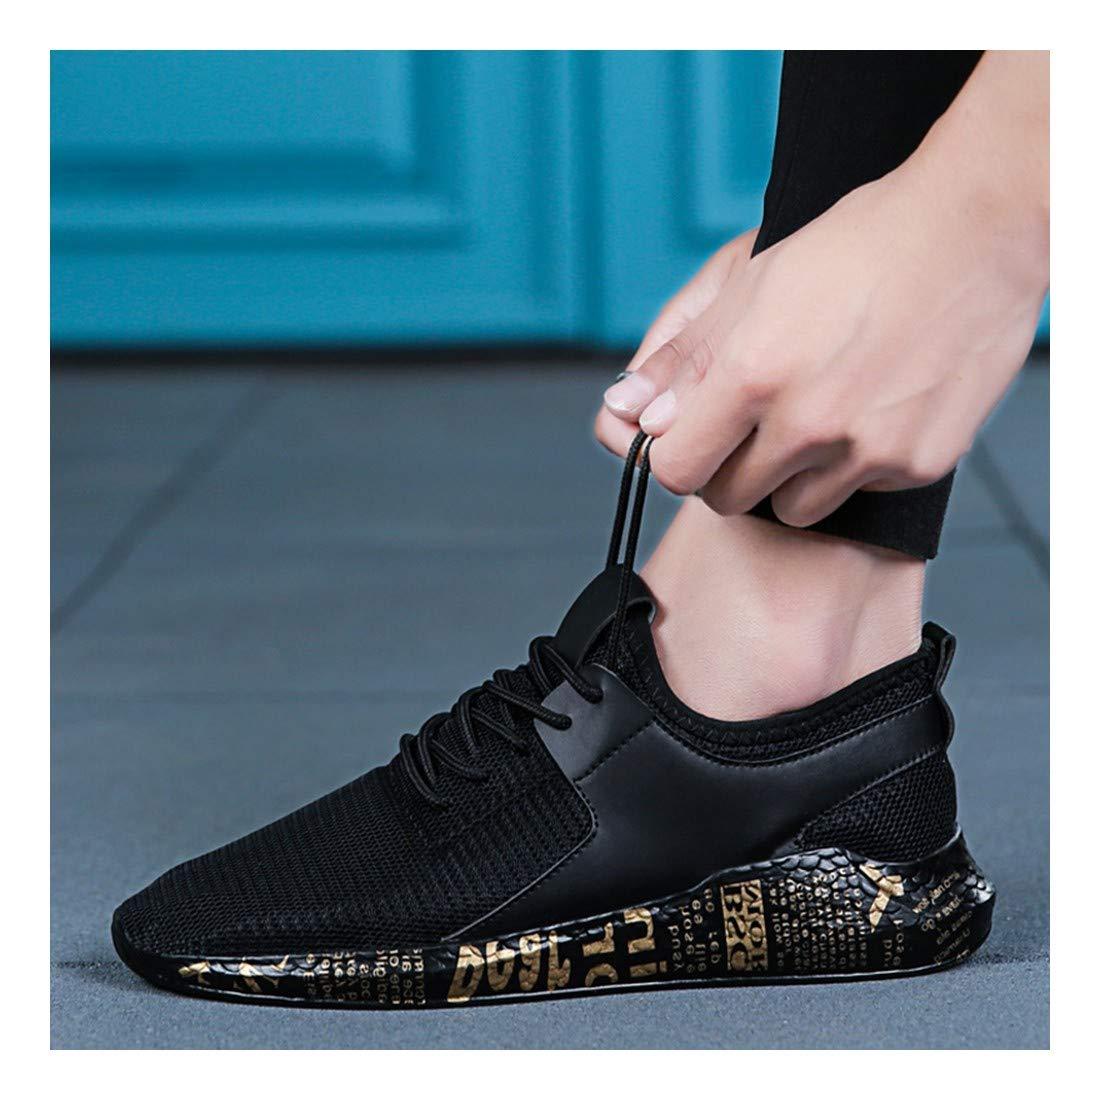 c7d7b0e6318041 YAYADI Scarpe scarpe da ginnastica Formatori Traspirante Scarpe Casual  Jogging Jogging Jogging Fitness Leggero Scarpe Traspiranti